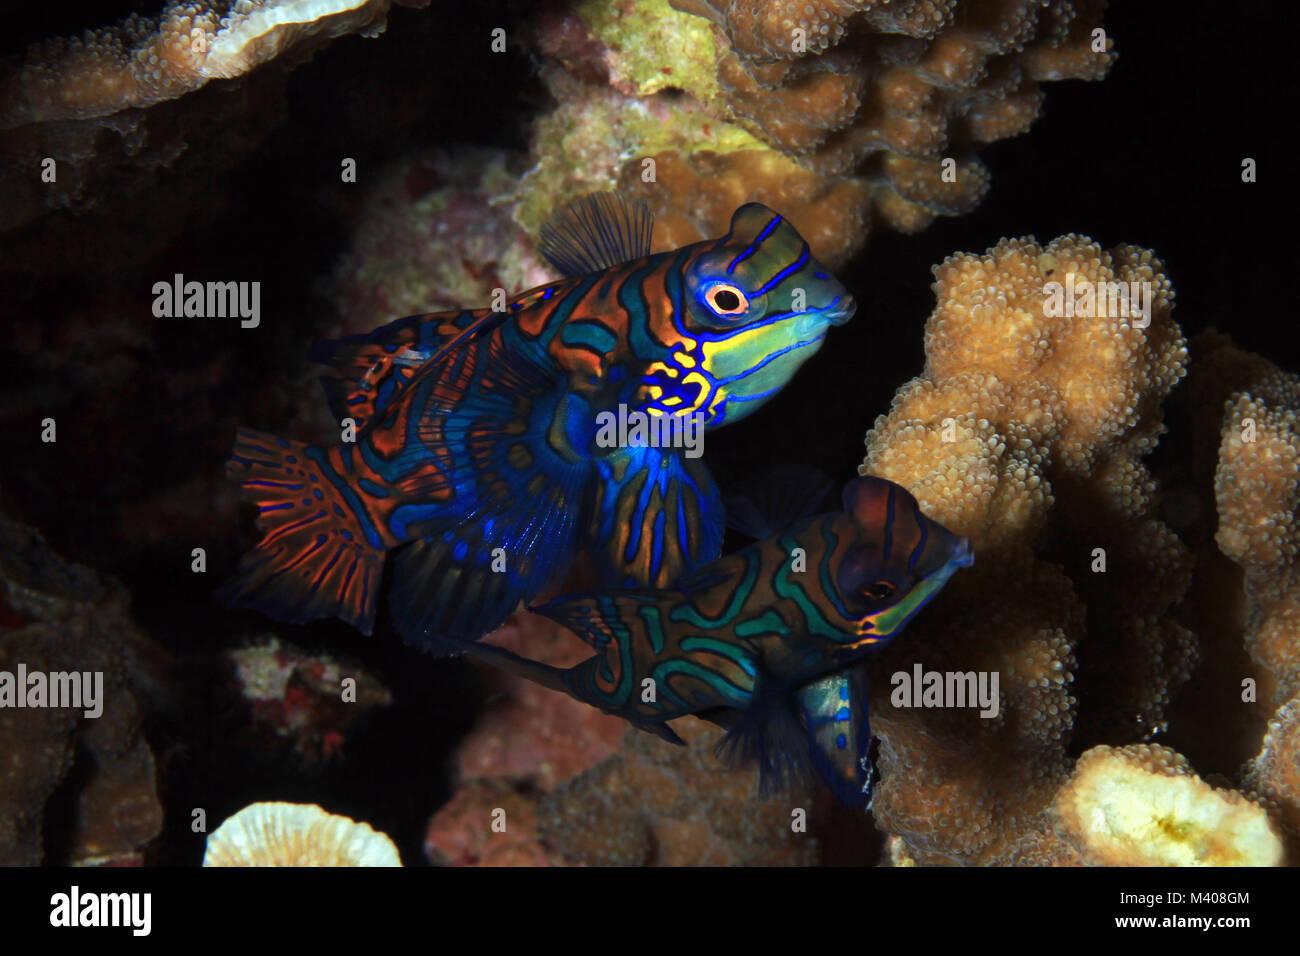 Mandarinfish Couple (aka Mandarin Dragonet, Synchiropus splendidus), about to Mate. Moalboal, Philippines - Stock Image